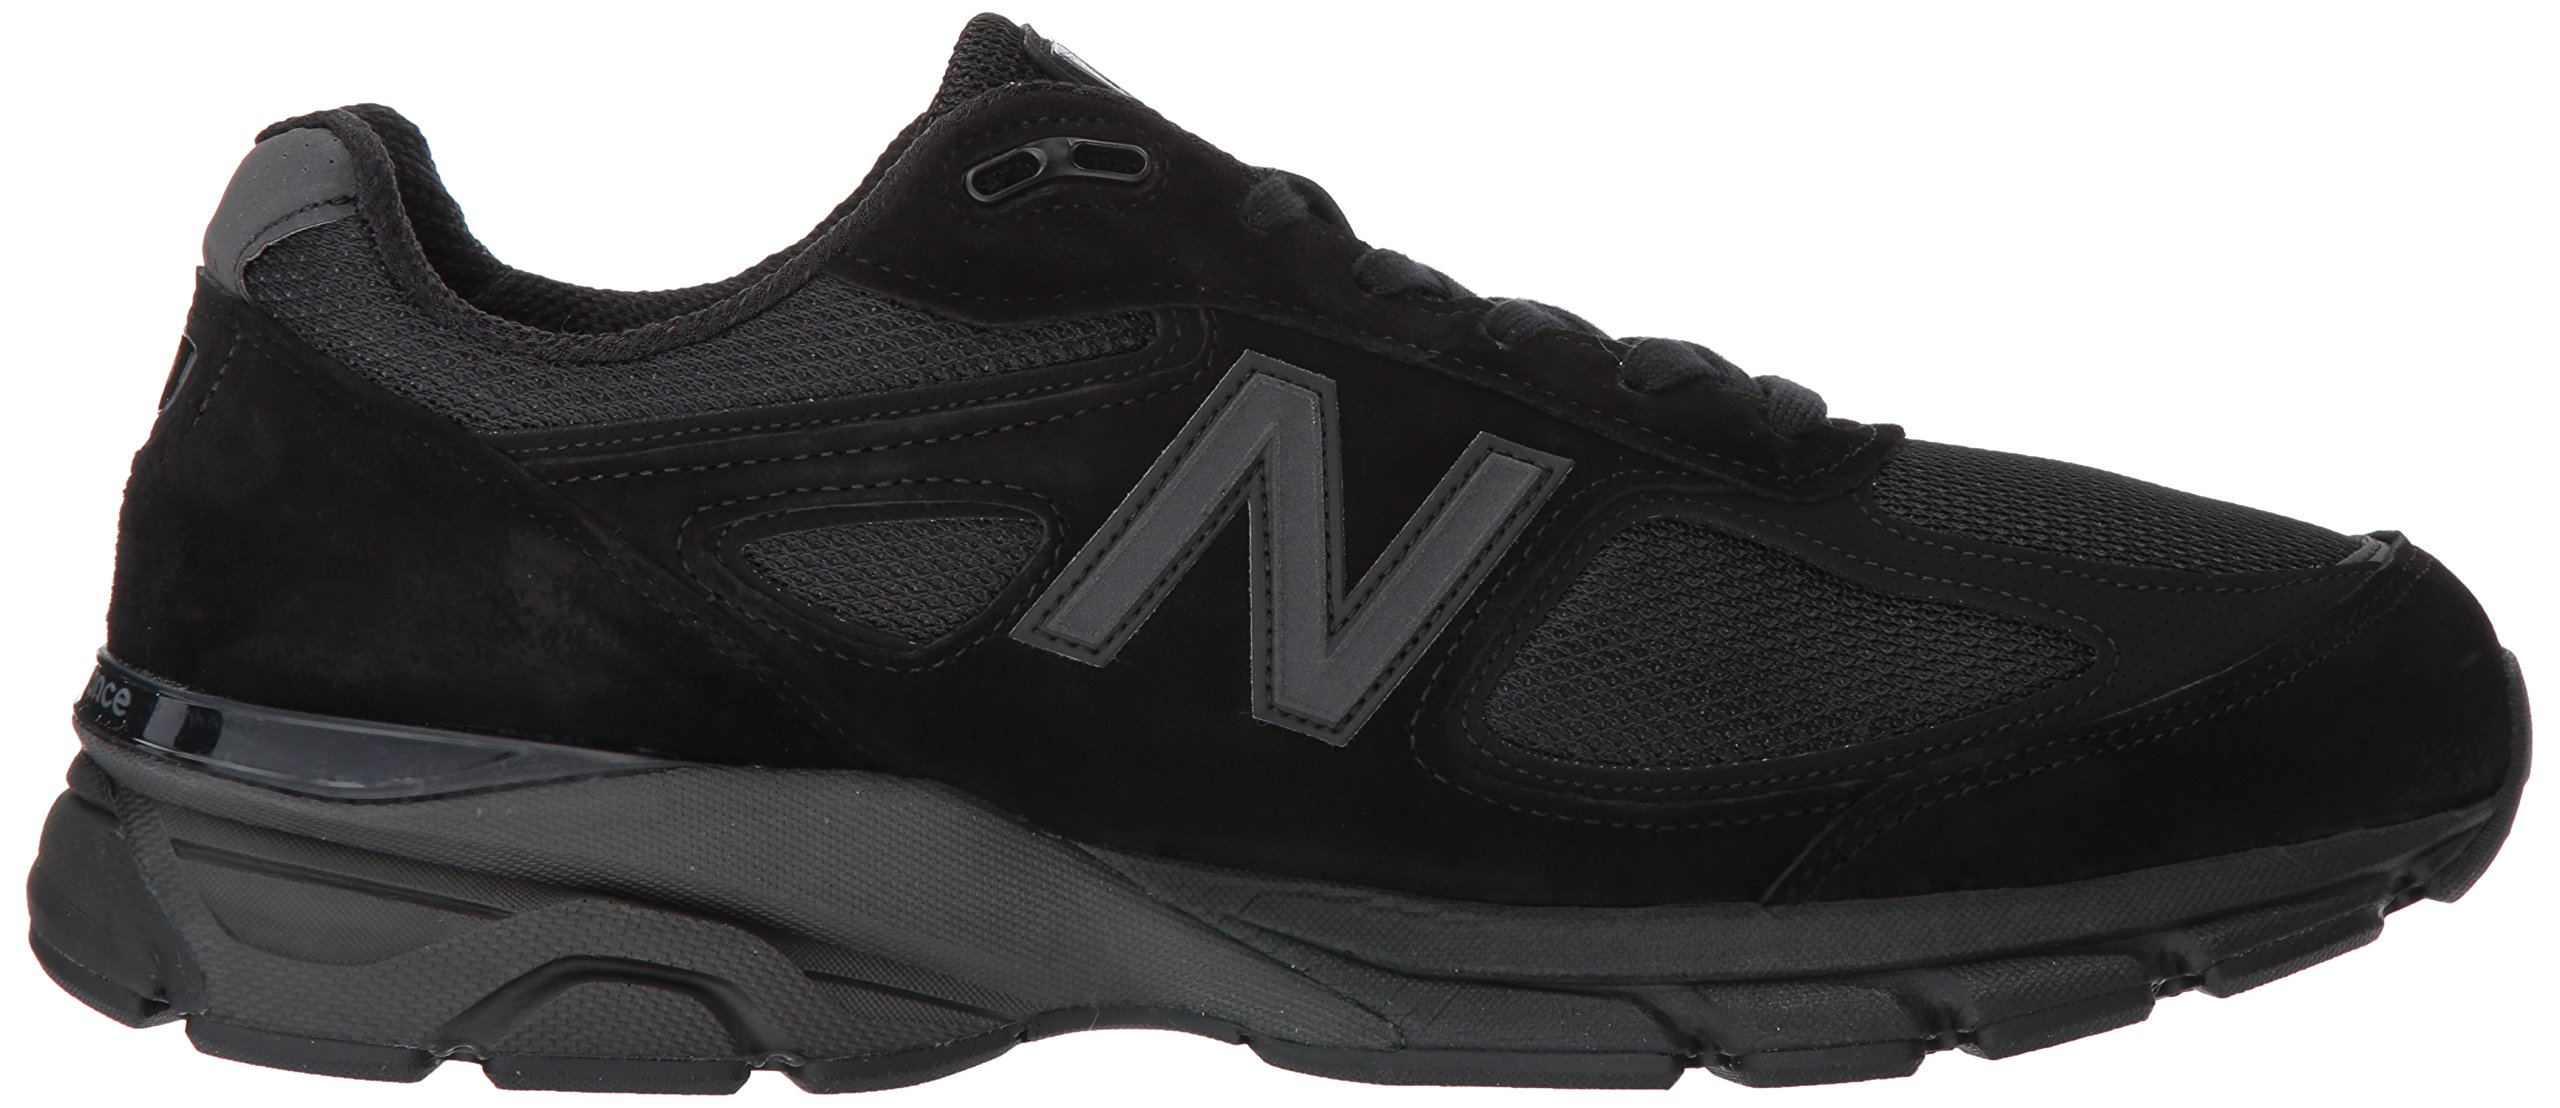 New Balance Men's 990V4 Running Shoe, Black/Black, 11 2E US by New Balance (Image #7)